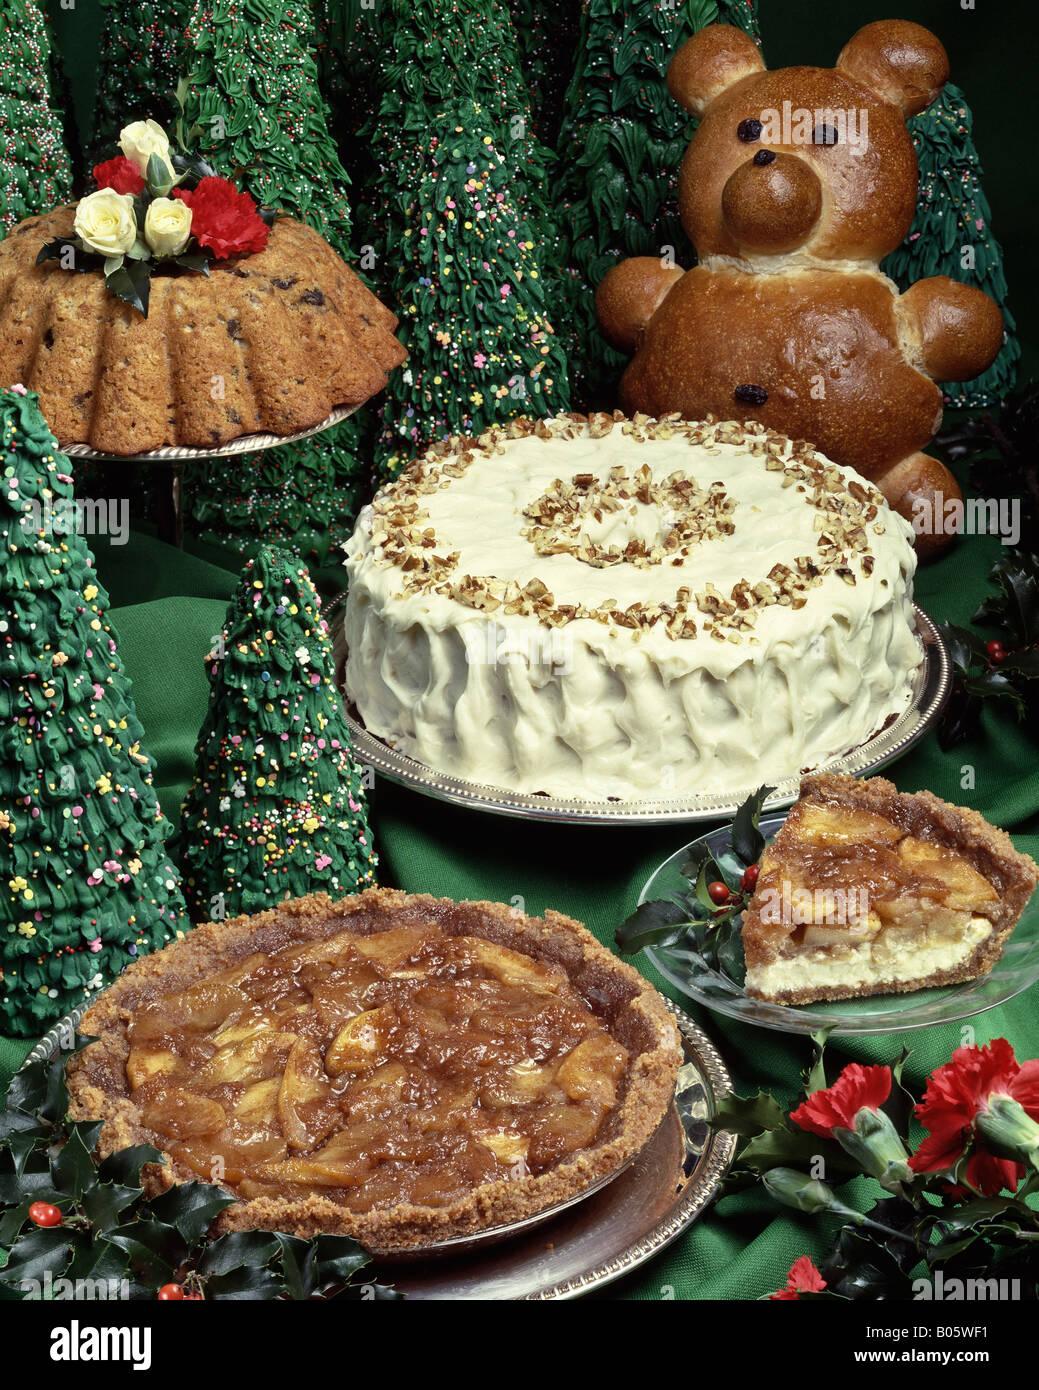 Country Kitchen Recipes Sour Cream Apple Pie Cake Vanilla Icing